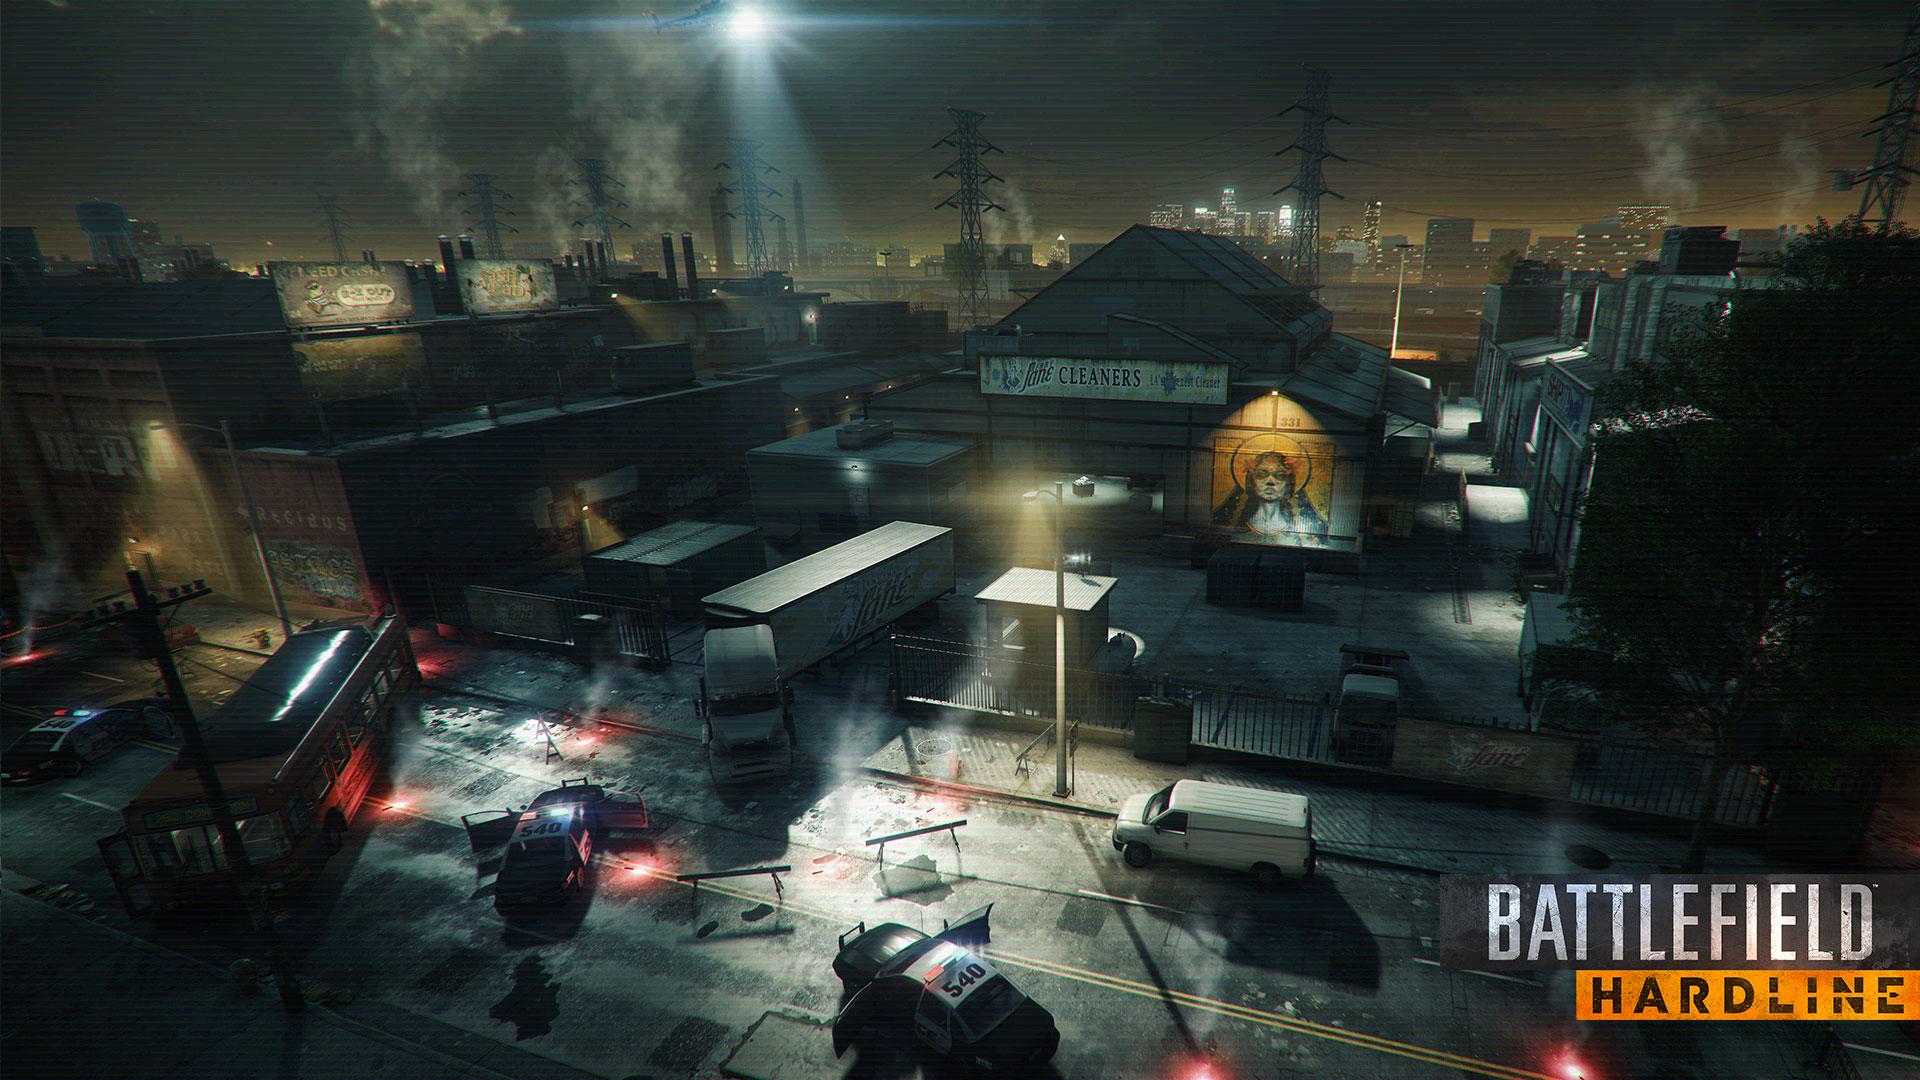 Battlefield Hardline - Xbox One - IGN